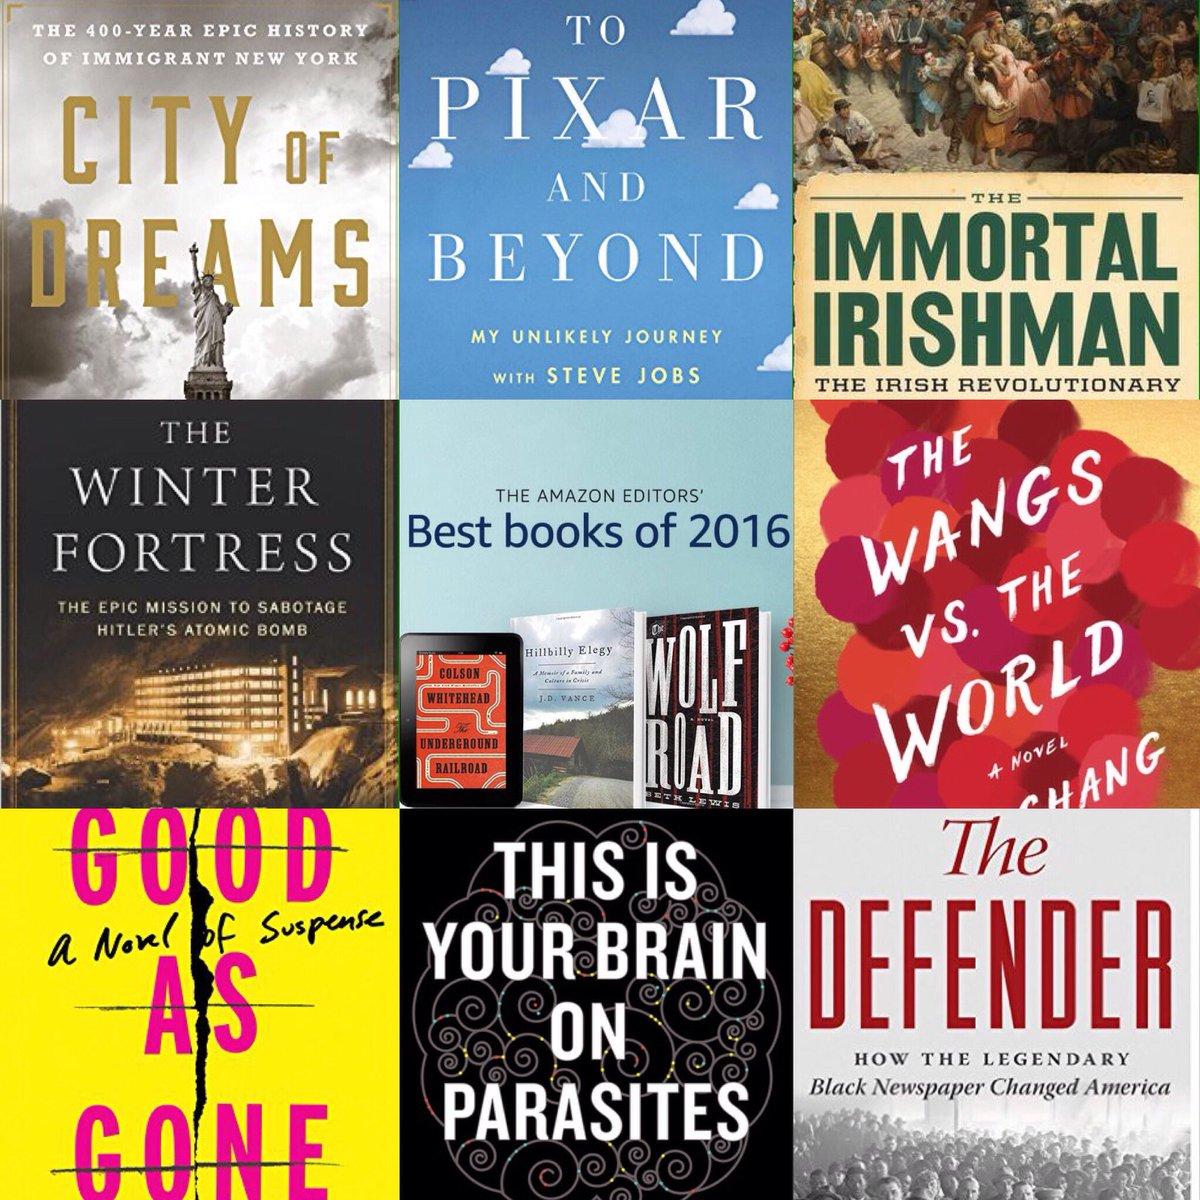 HMH Books on Twitter: